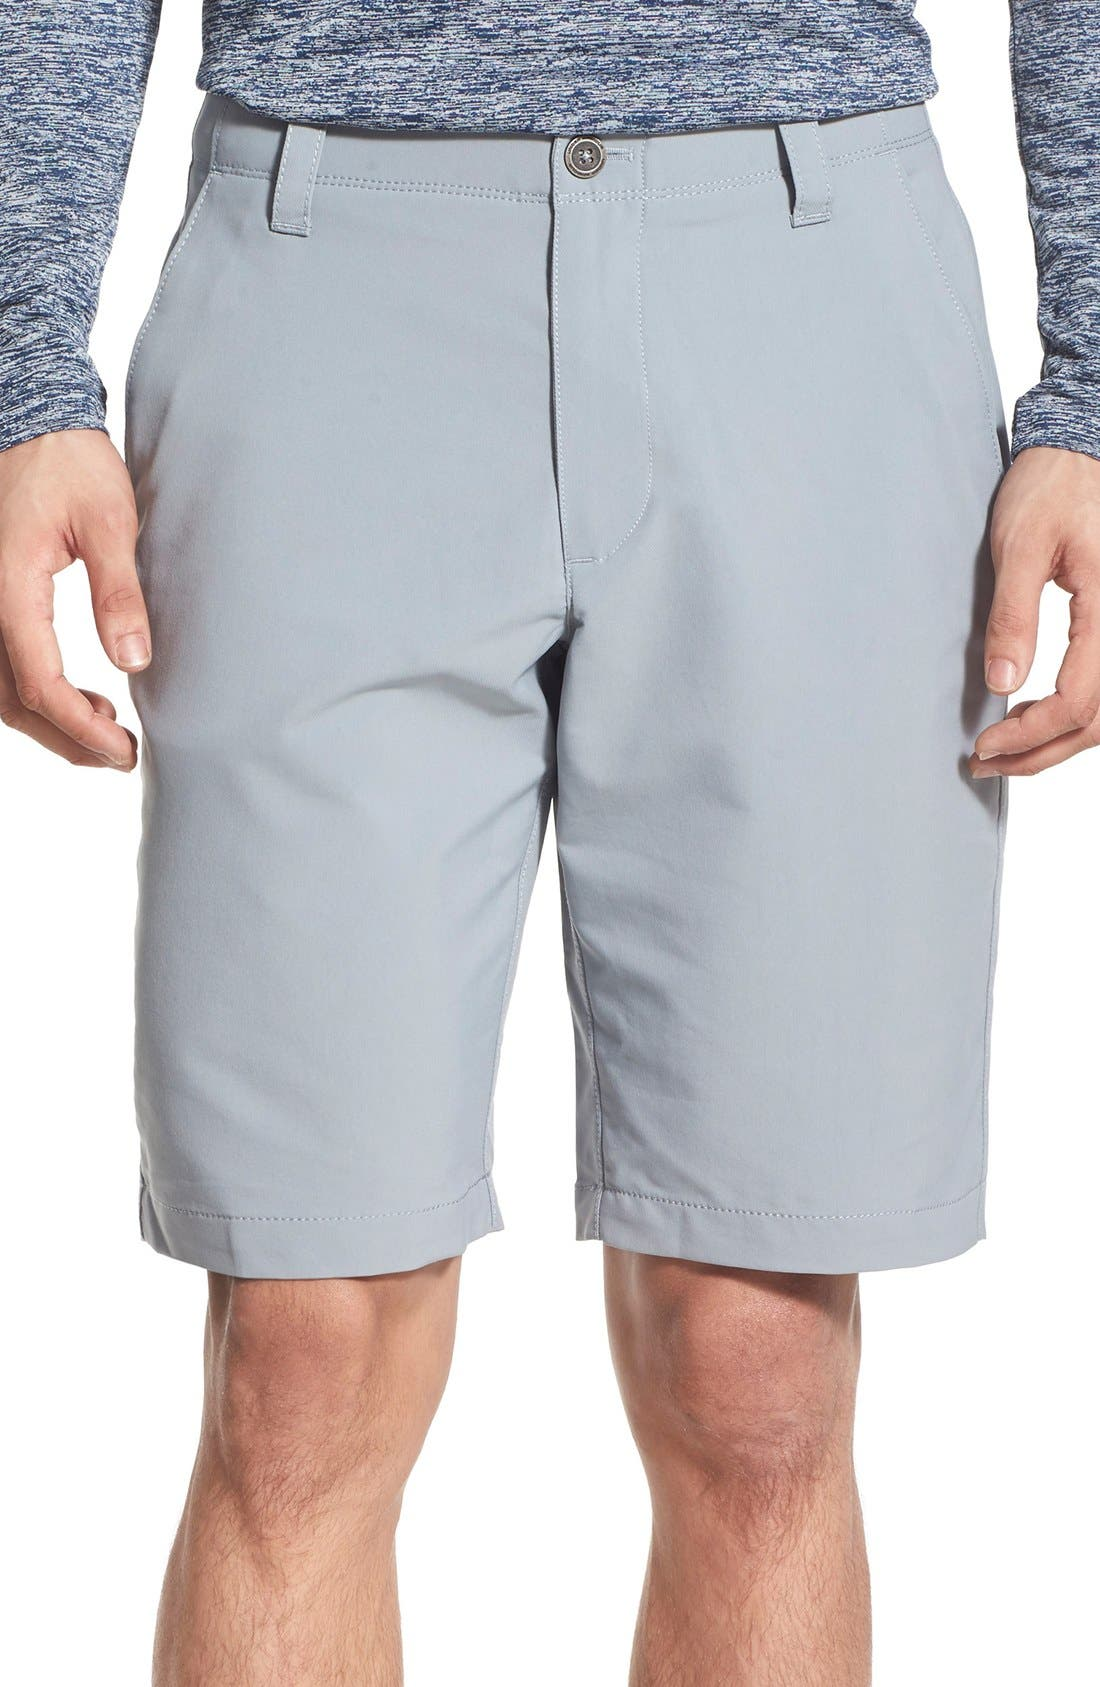 Under Armour 'Matchplay' Moisture Wicking Golf Shorts